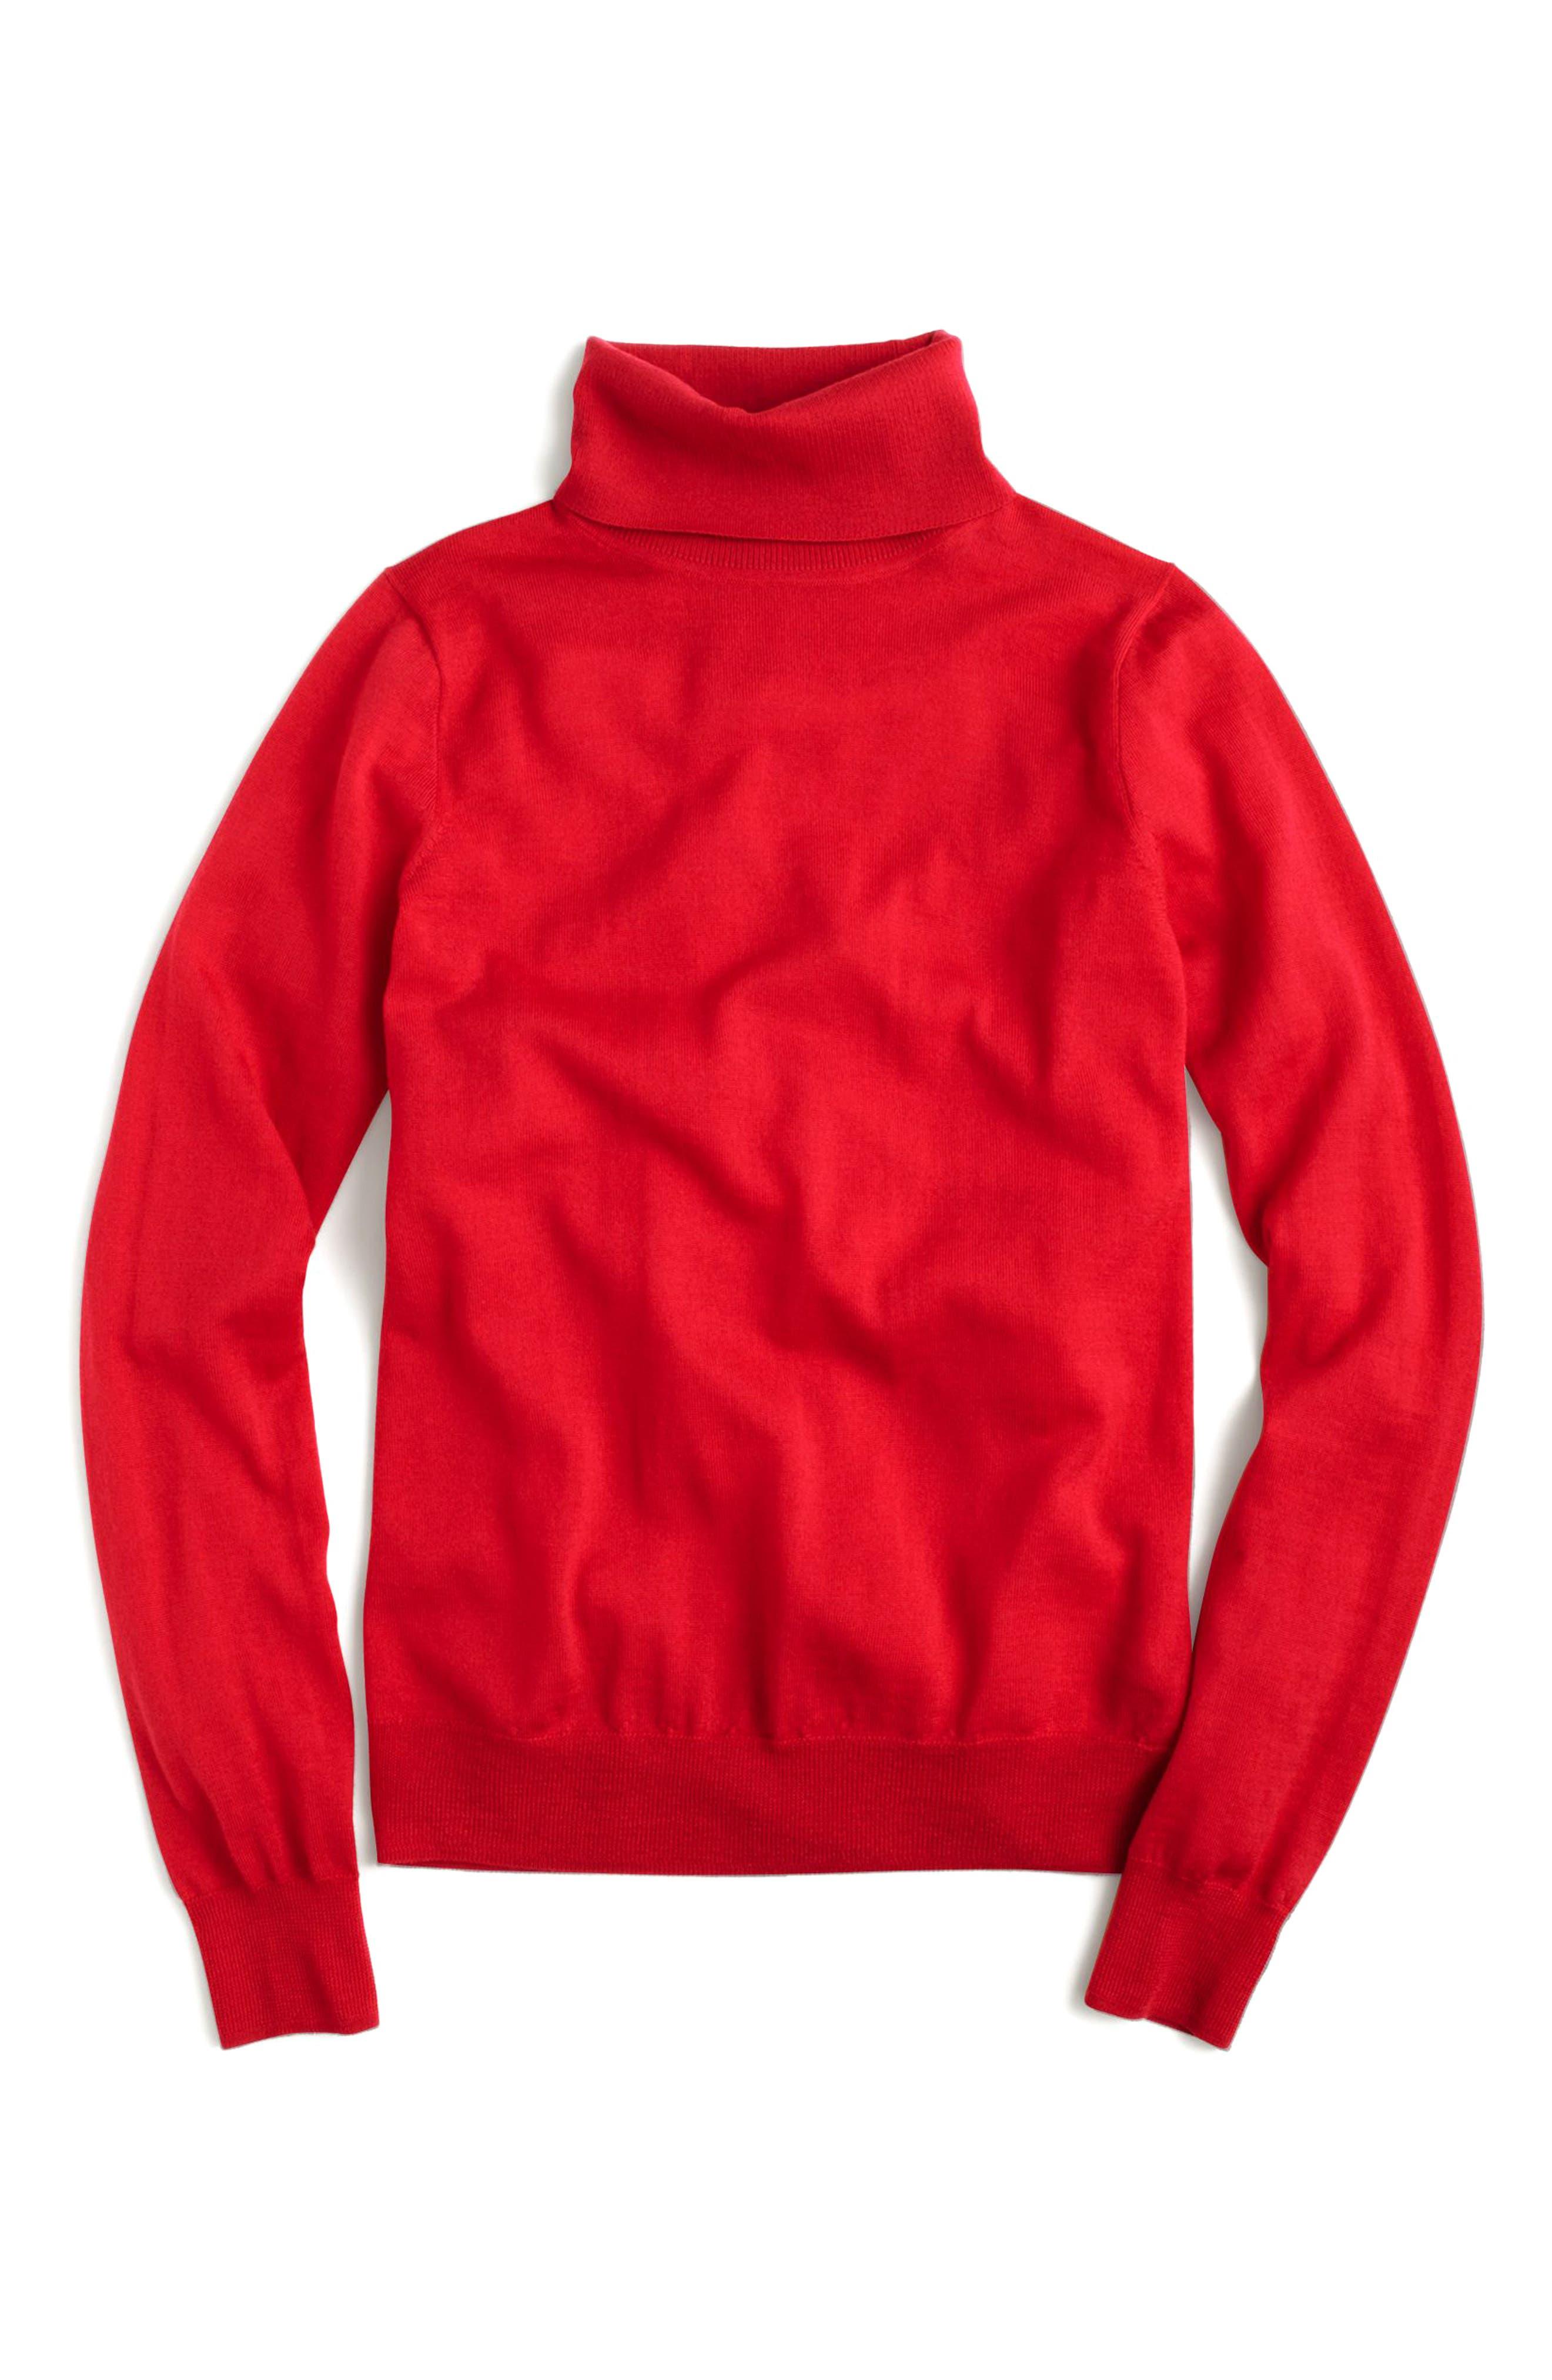 Tippi Turtleneck Sweater,                         Main,                         color, Dark Poppy